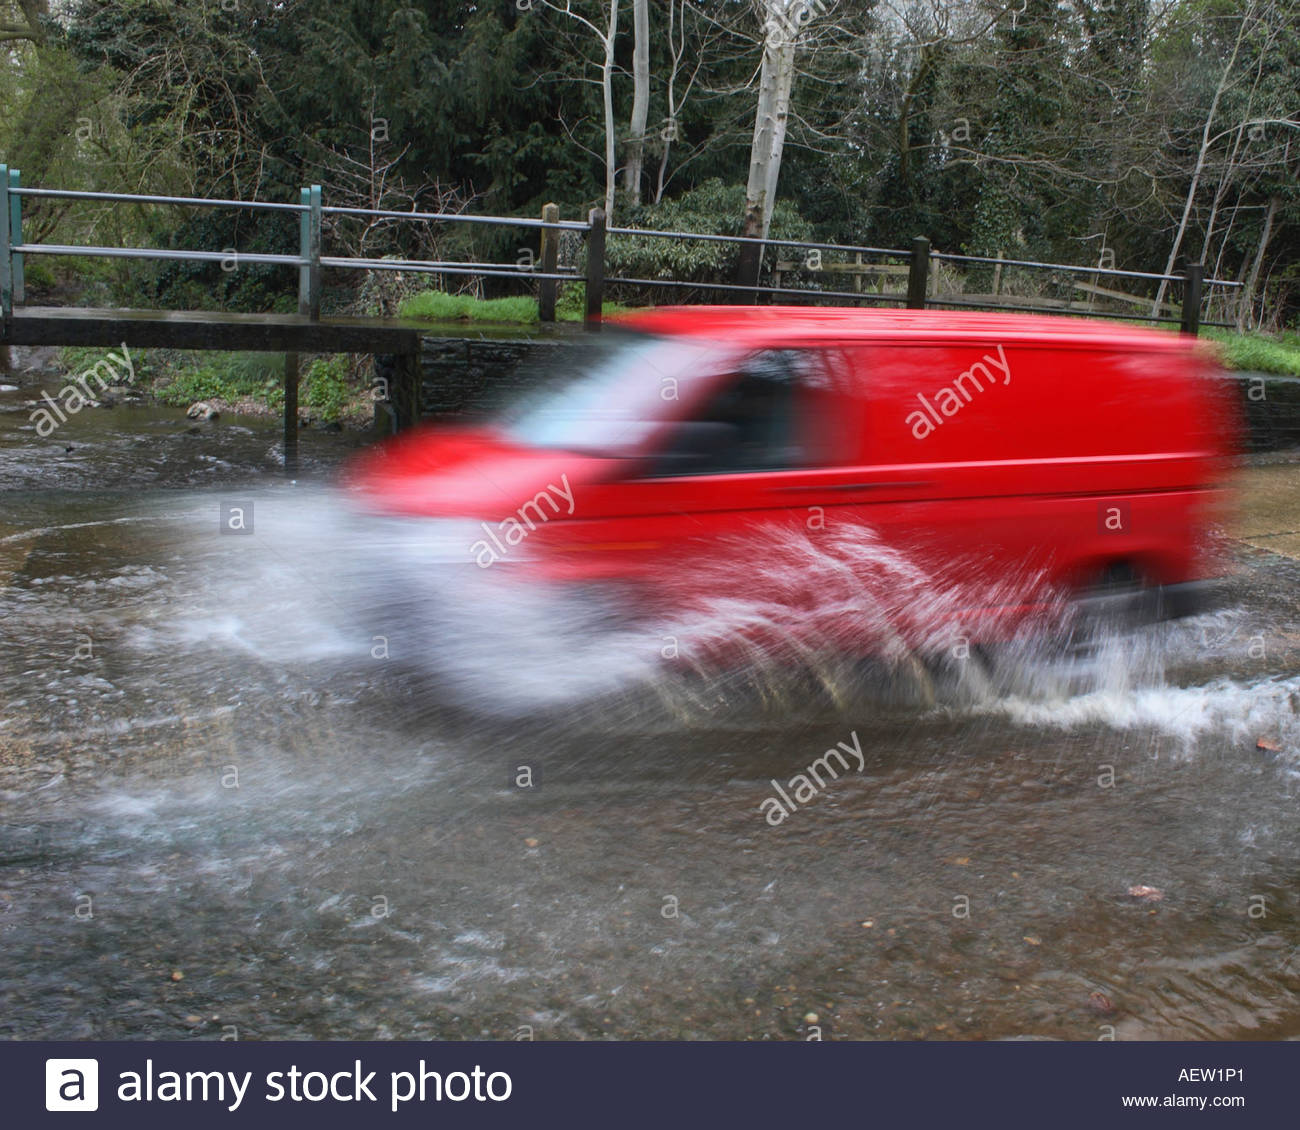 Driving Through Stream Ford Stock Photos Amp Driving Through Stream Ford Stock Images Alamy